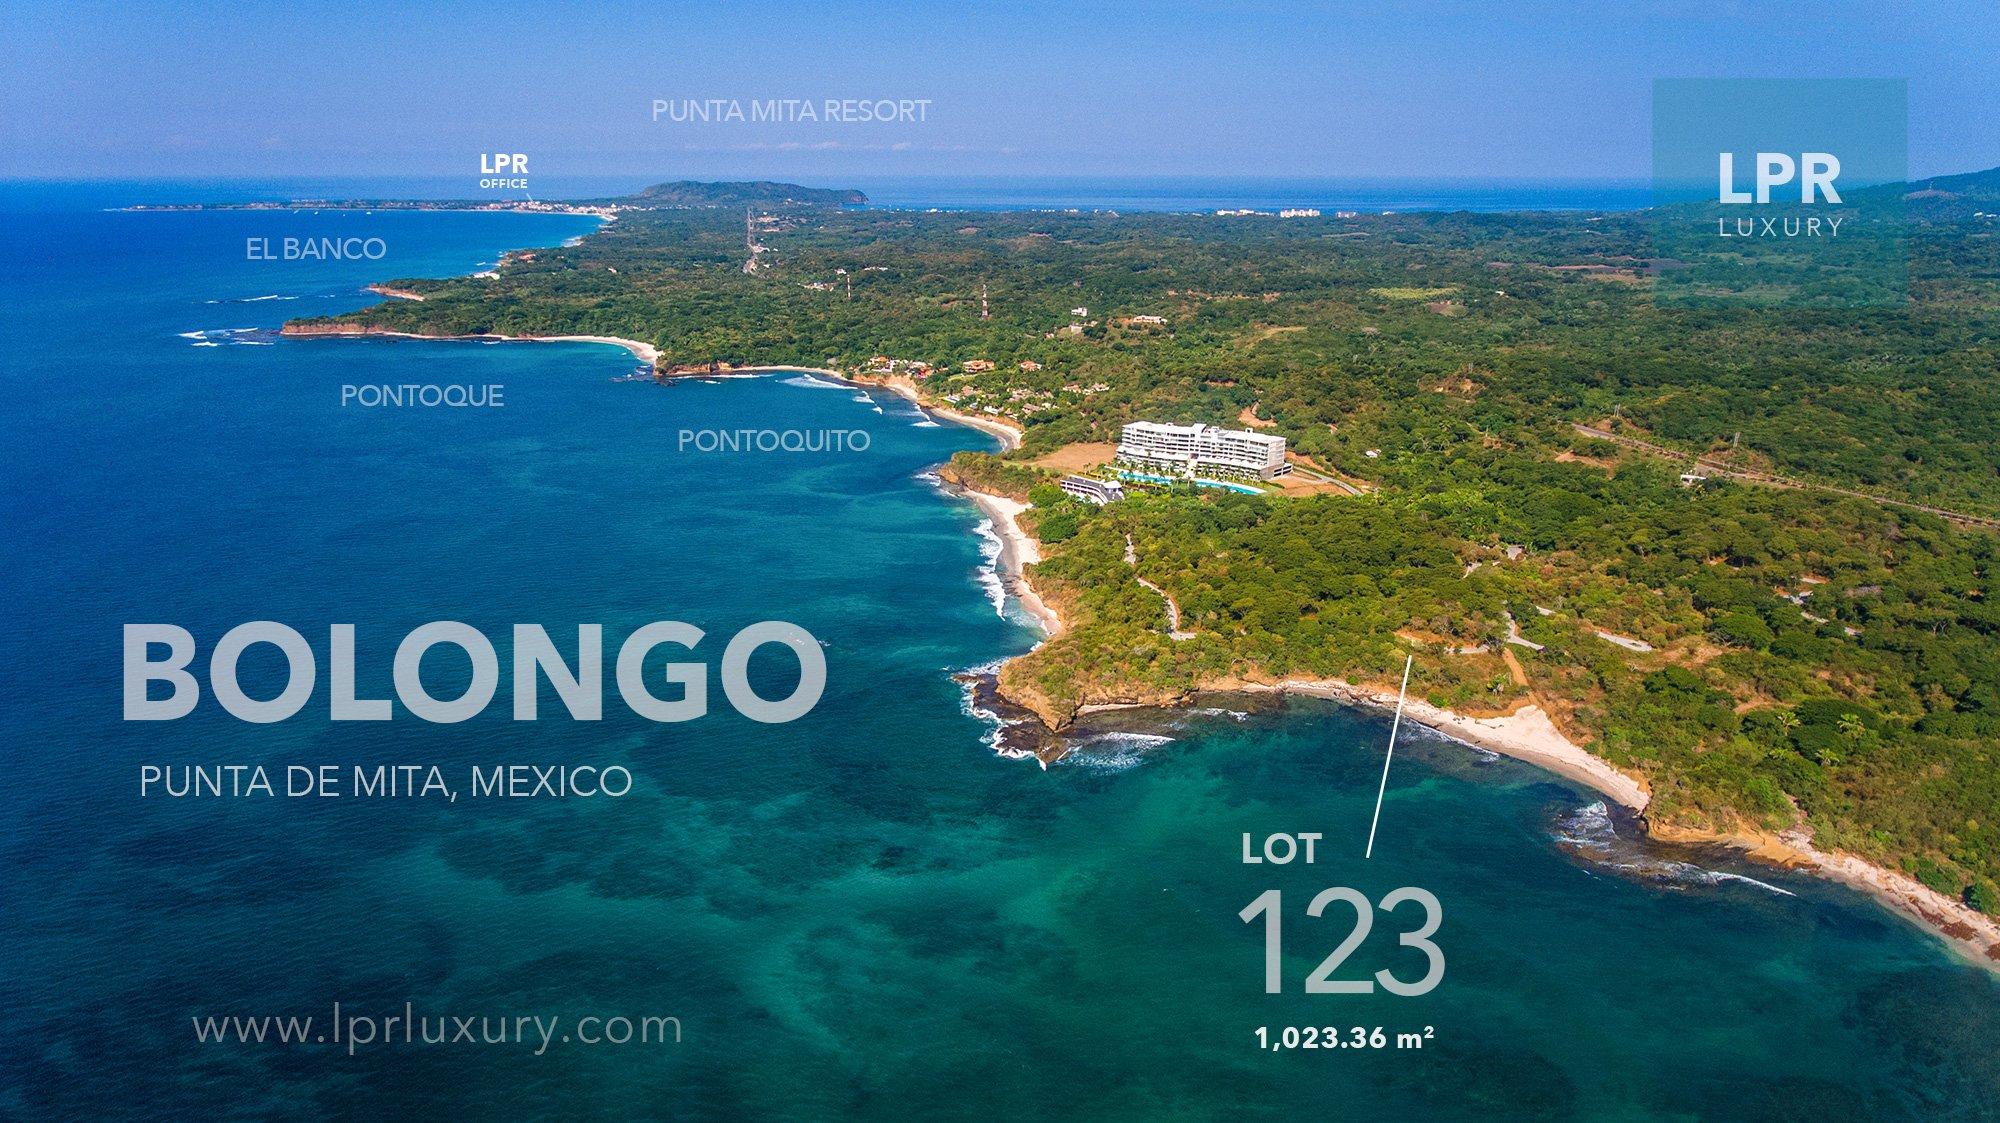 Bolongo - Punta de Mita beachfront real estate and vacation rentals - Condos and Villas for sale and rent. Riviera Nayarit, Mexico